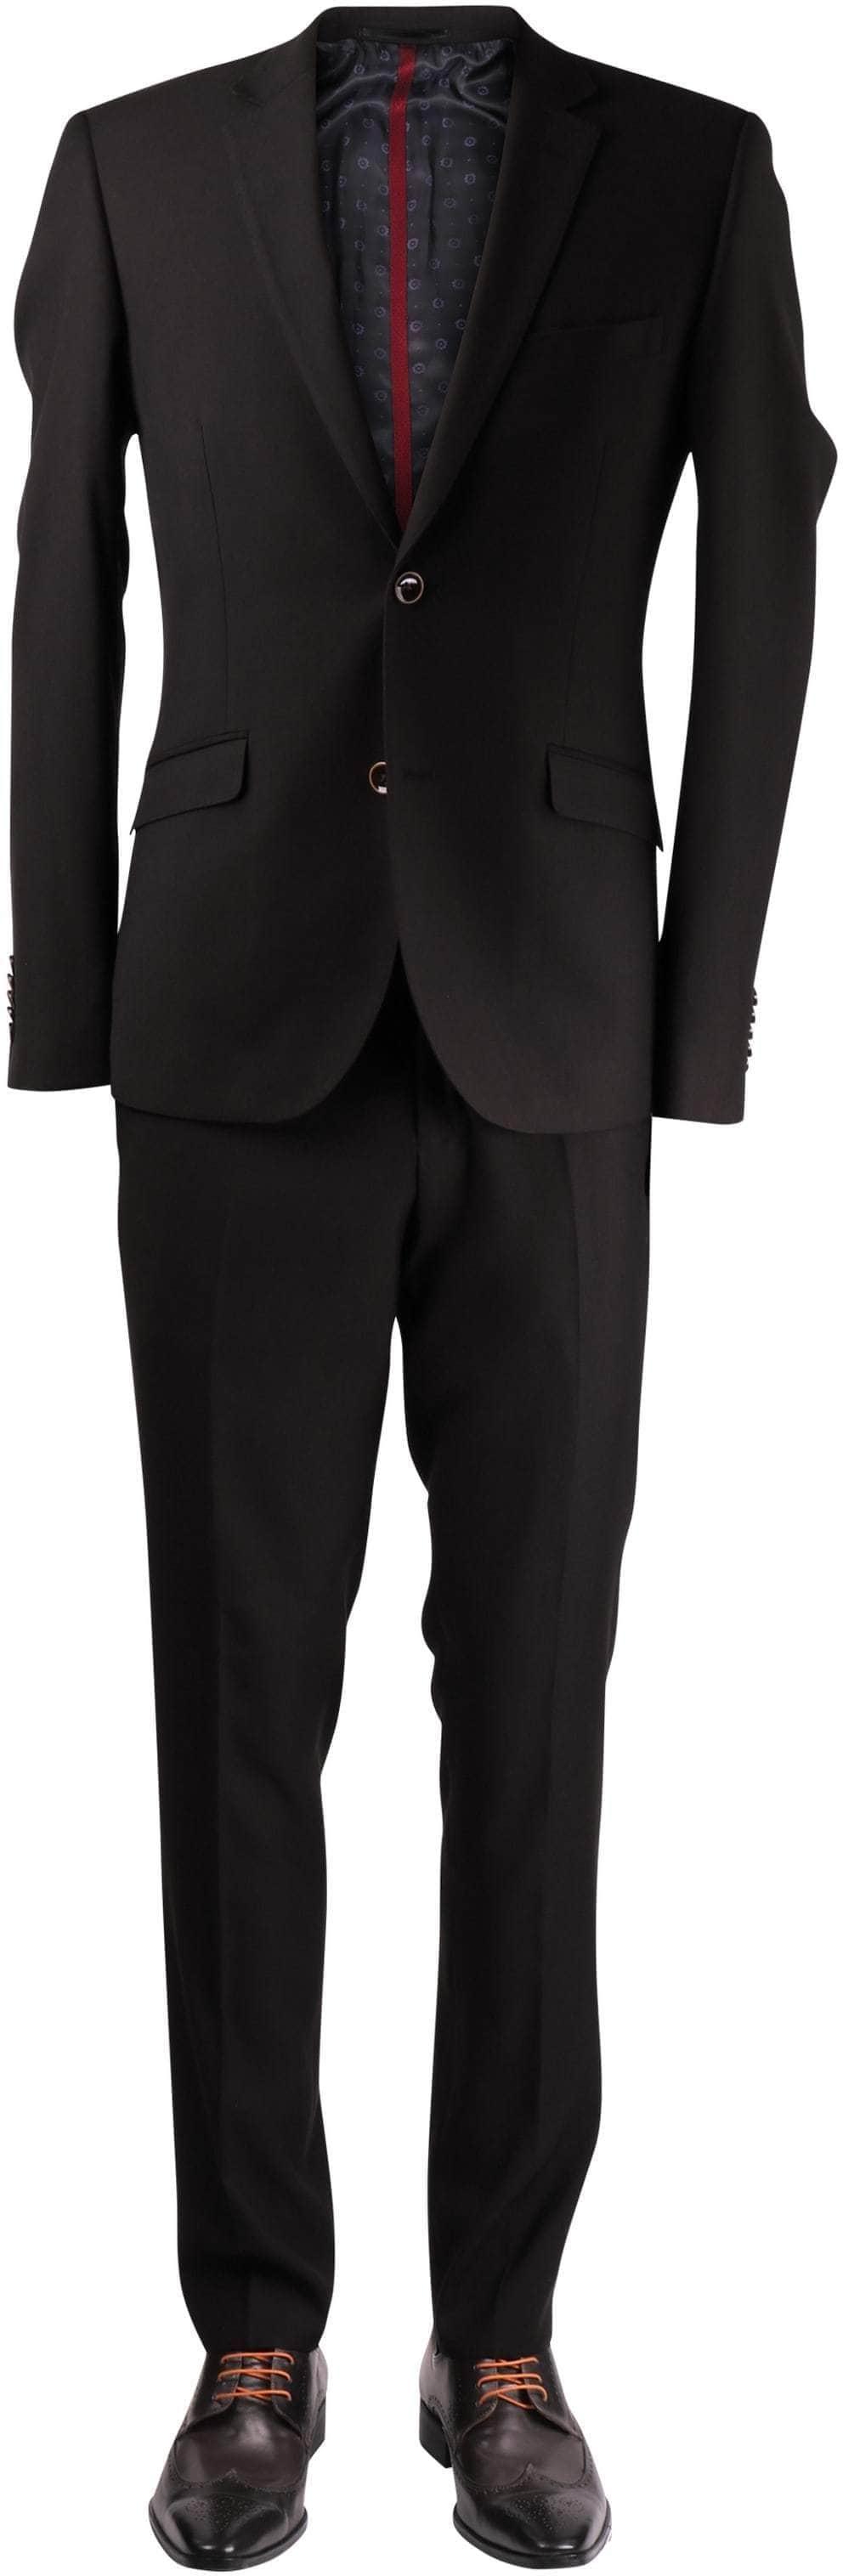 Schwarz Anzug Waynes